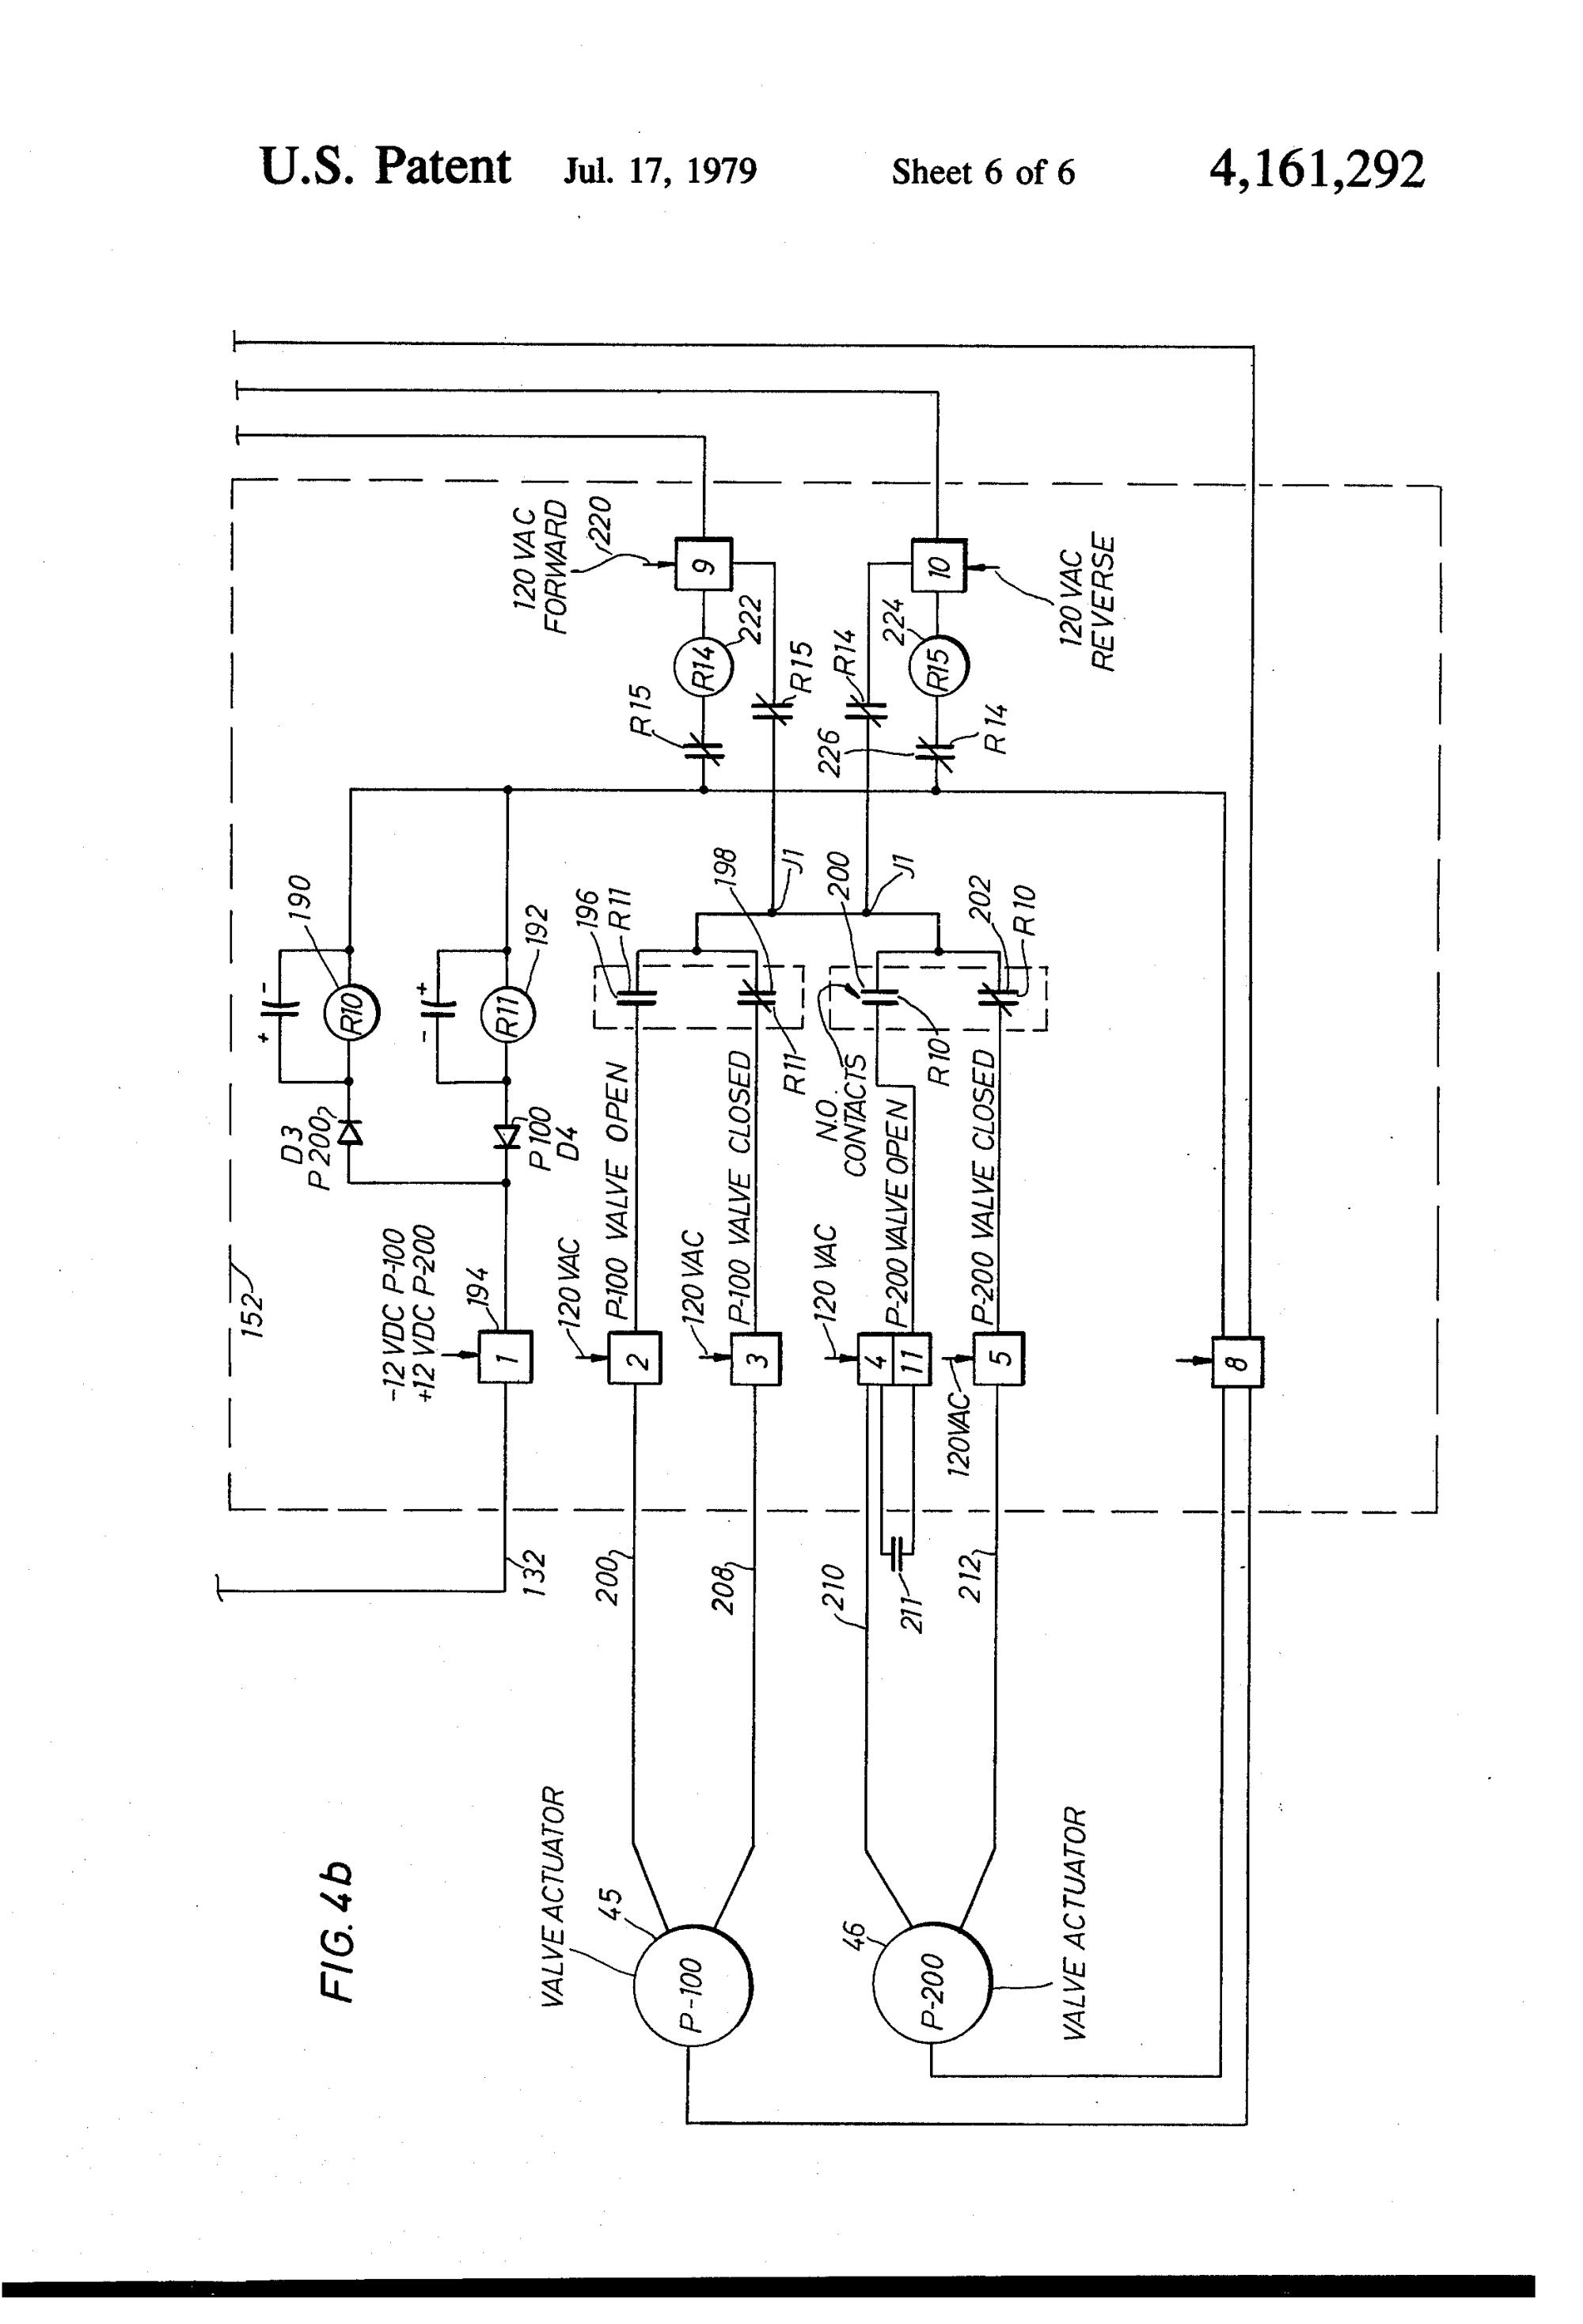 Capasitor Sukup Stir Ator Wiring Diagram 1989 Ez Go Textron Golf Cart Wiring Diagram For Wiring Diagram Schematics